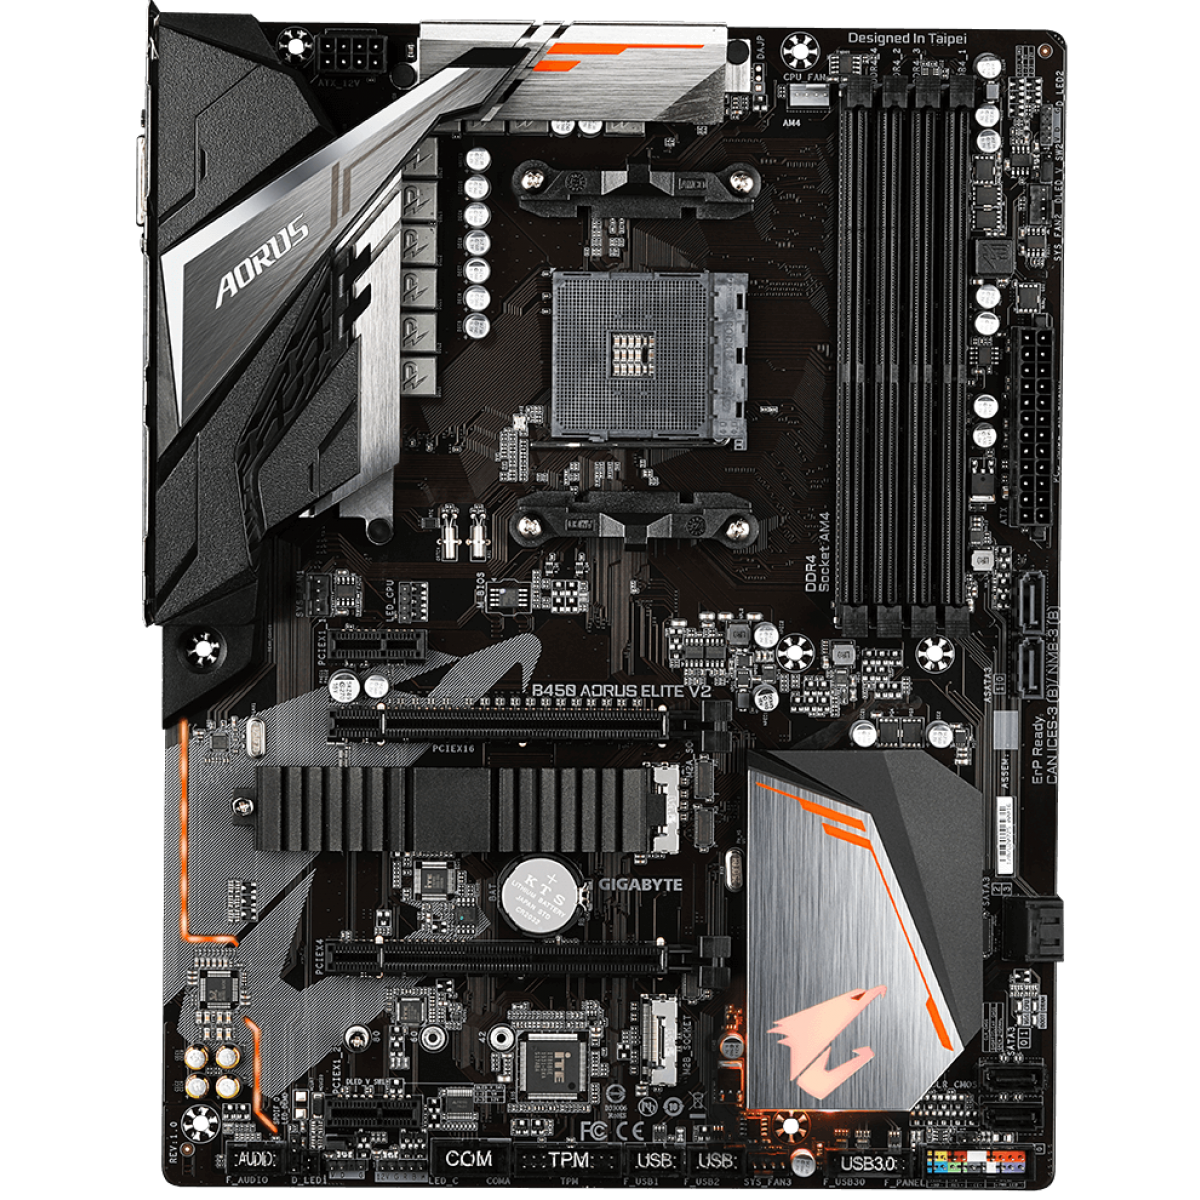 Placa Mãe Gigabyte B450 Aorus Elite V2, Chipset B450, AMD AM4, ATX, DDR4, 9MB45AET2-00-10